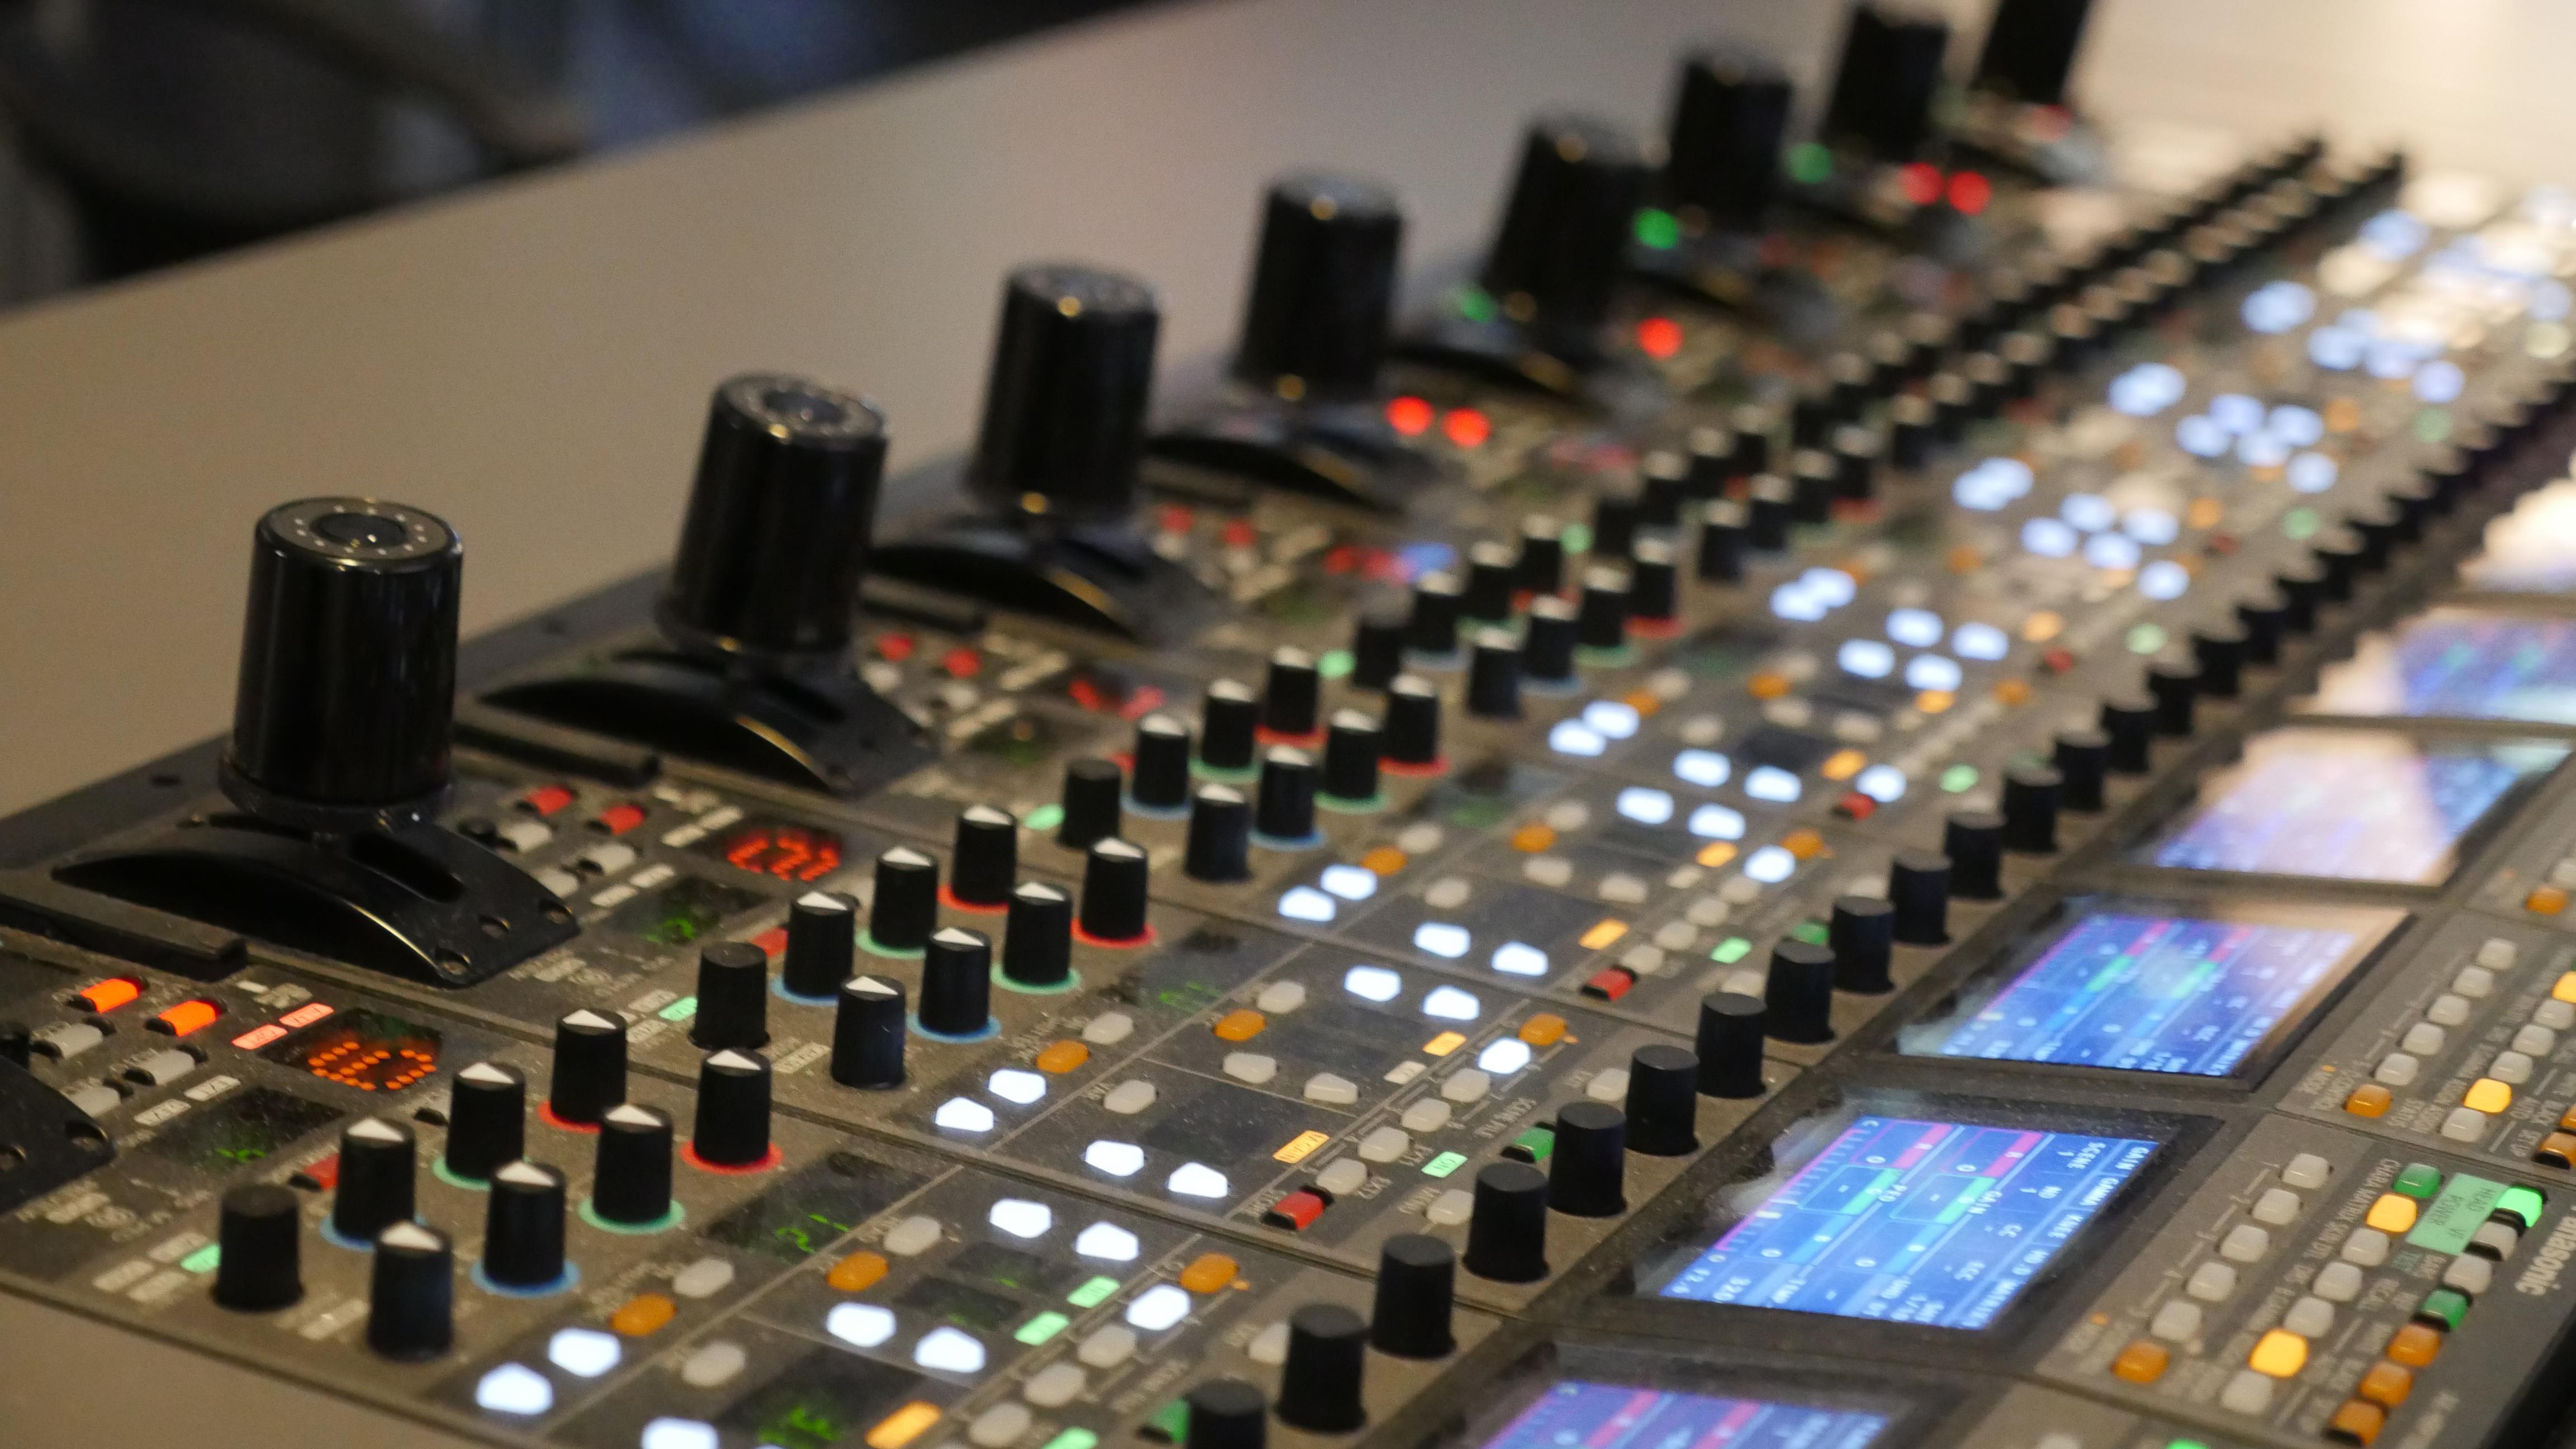 photo: Studio 6 at the Berliner Philharmonie